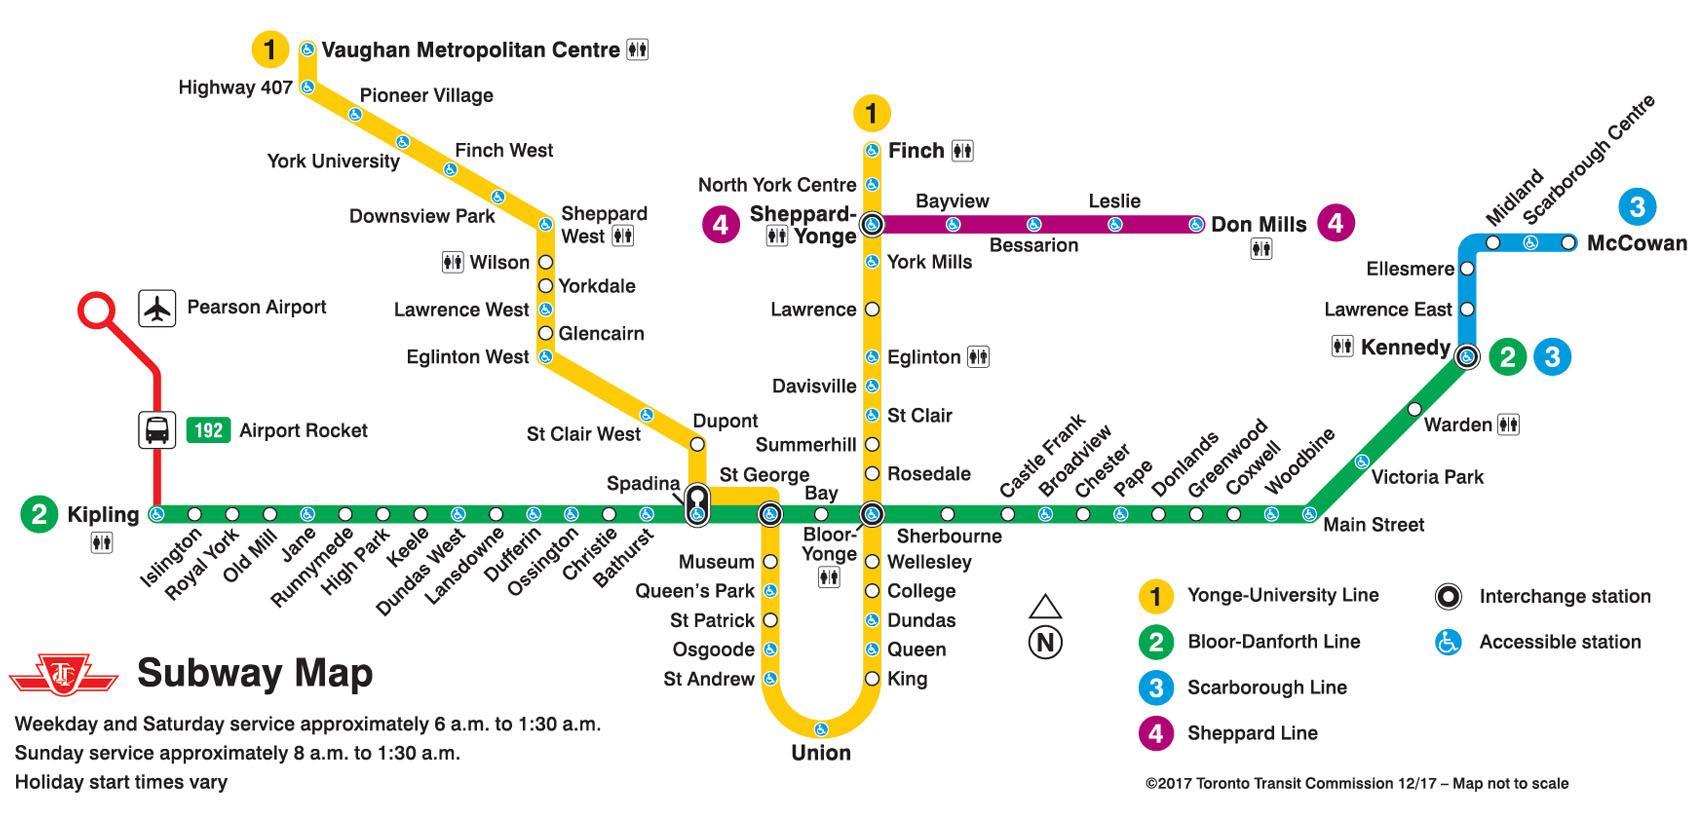 subway map toronto  ttc subway map toronto (canada) - ttc subway map toronto